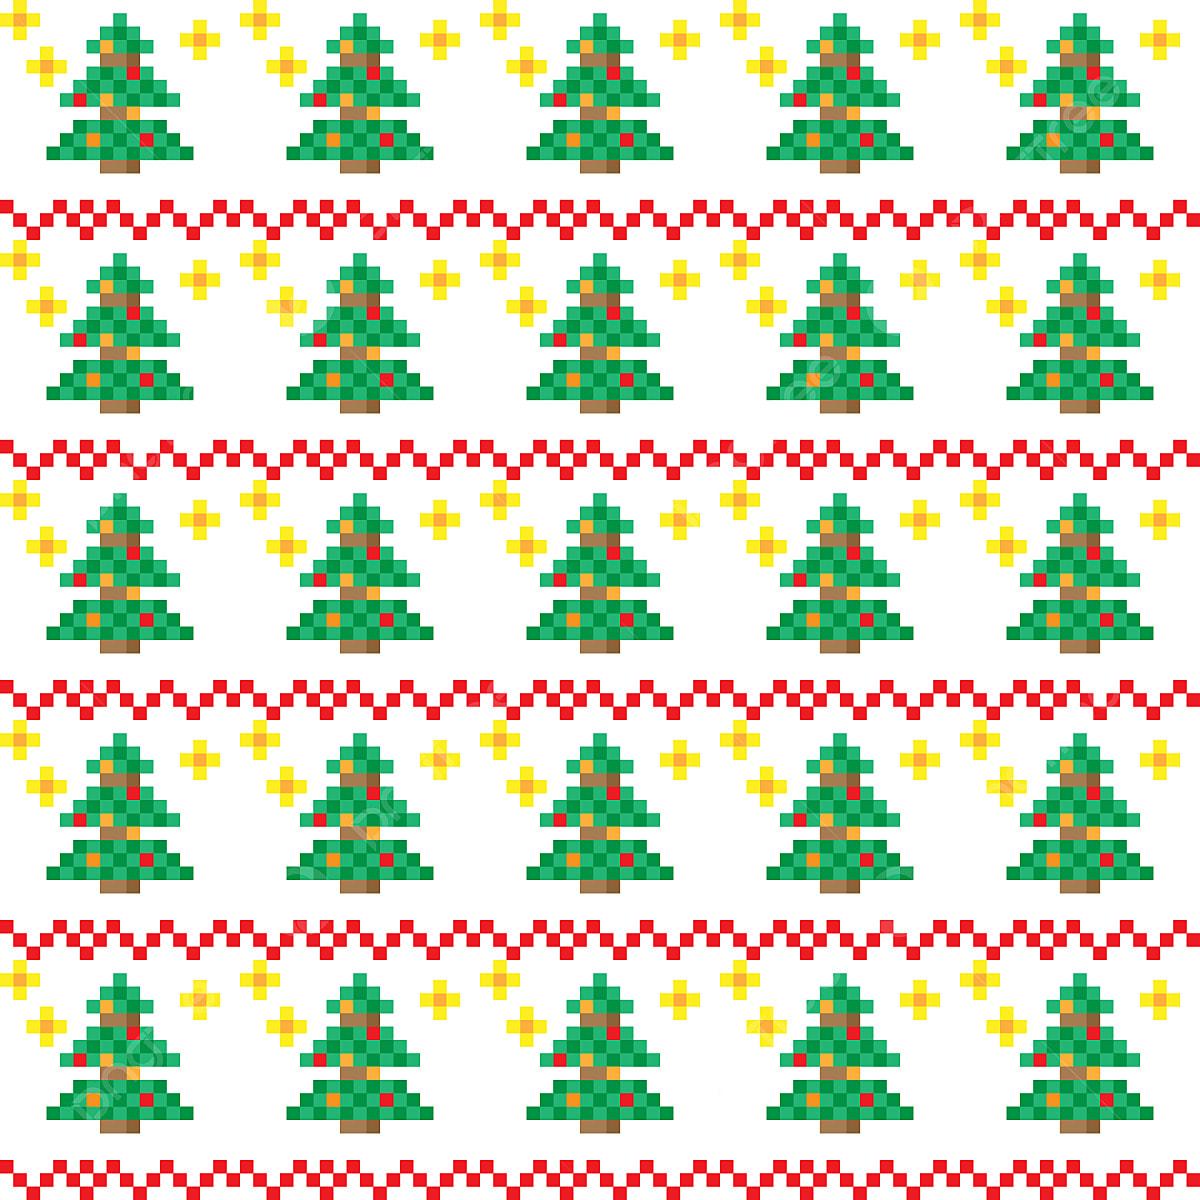 Les Schémas En Pixel Art Noël Noël Schéma Contexte Png Et